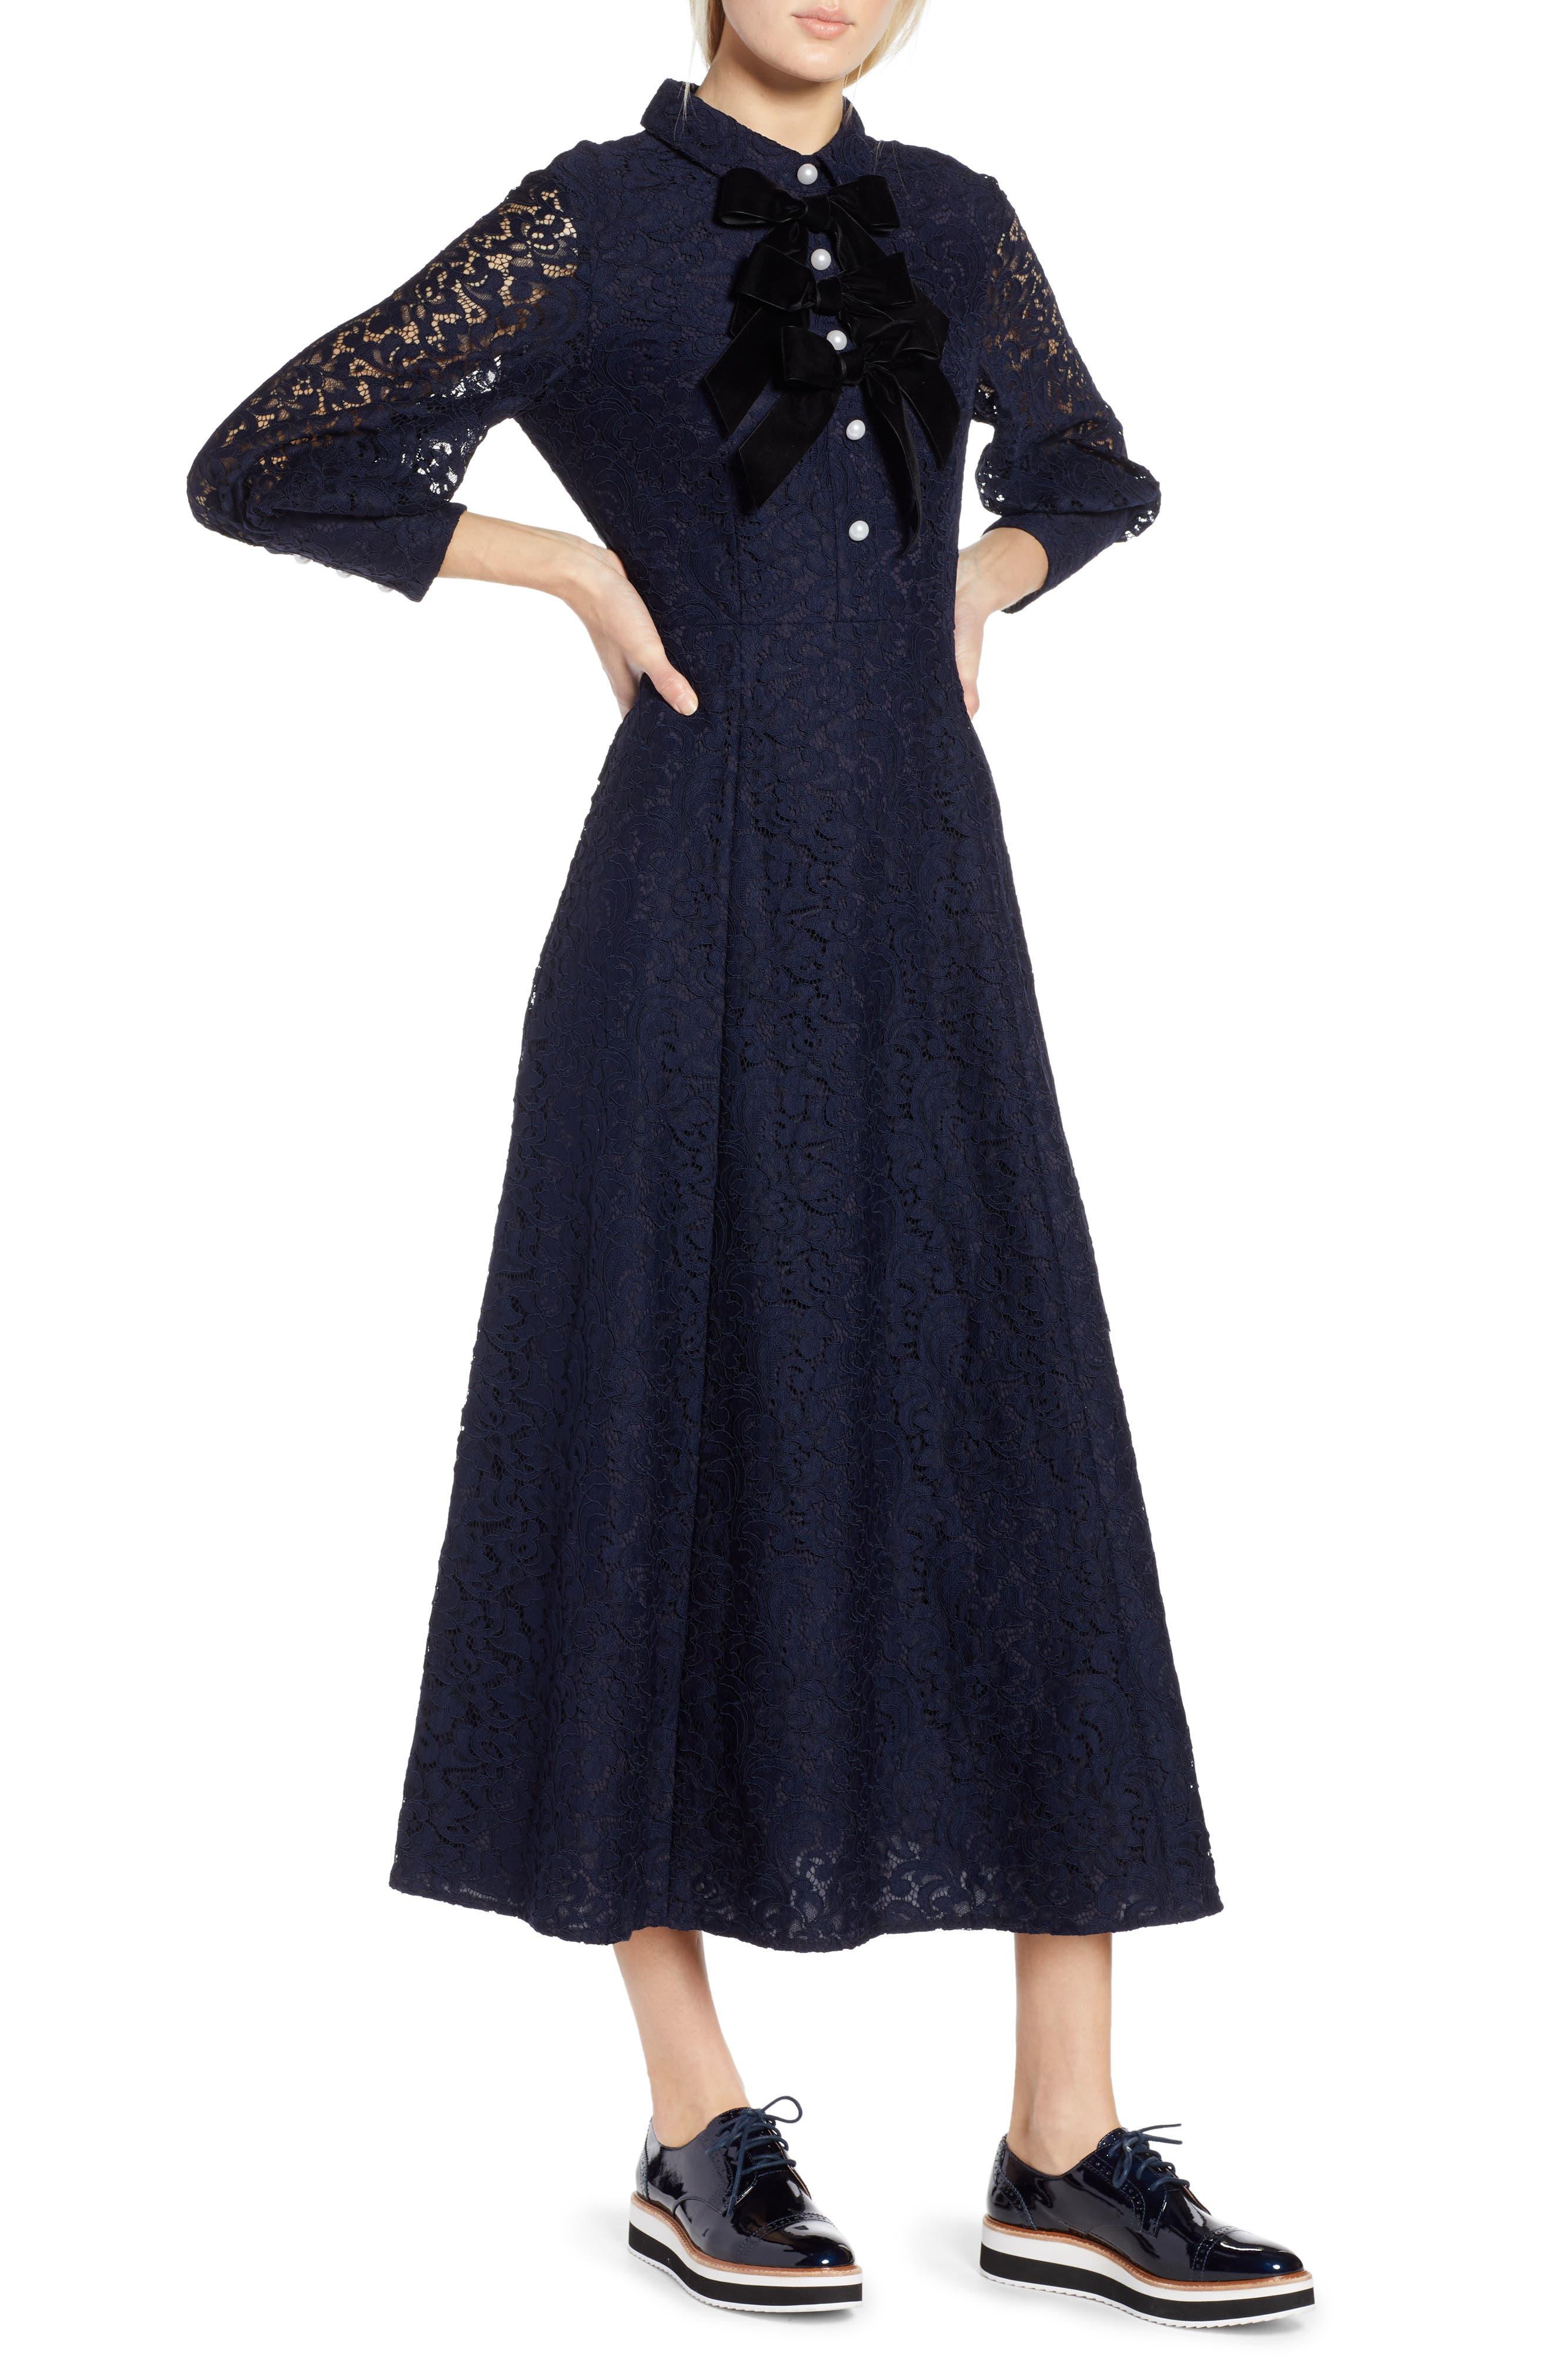 1930s Day Dresses, Afternoon Dresses History Petite Womens Halogen X Atlantic-Pacific Bow Detail Lace Midi Dress Size 16P - Blue $159.00 AT vintagedancer.com